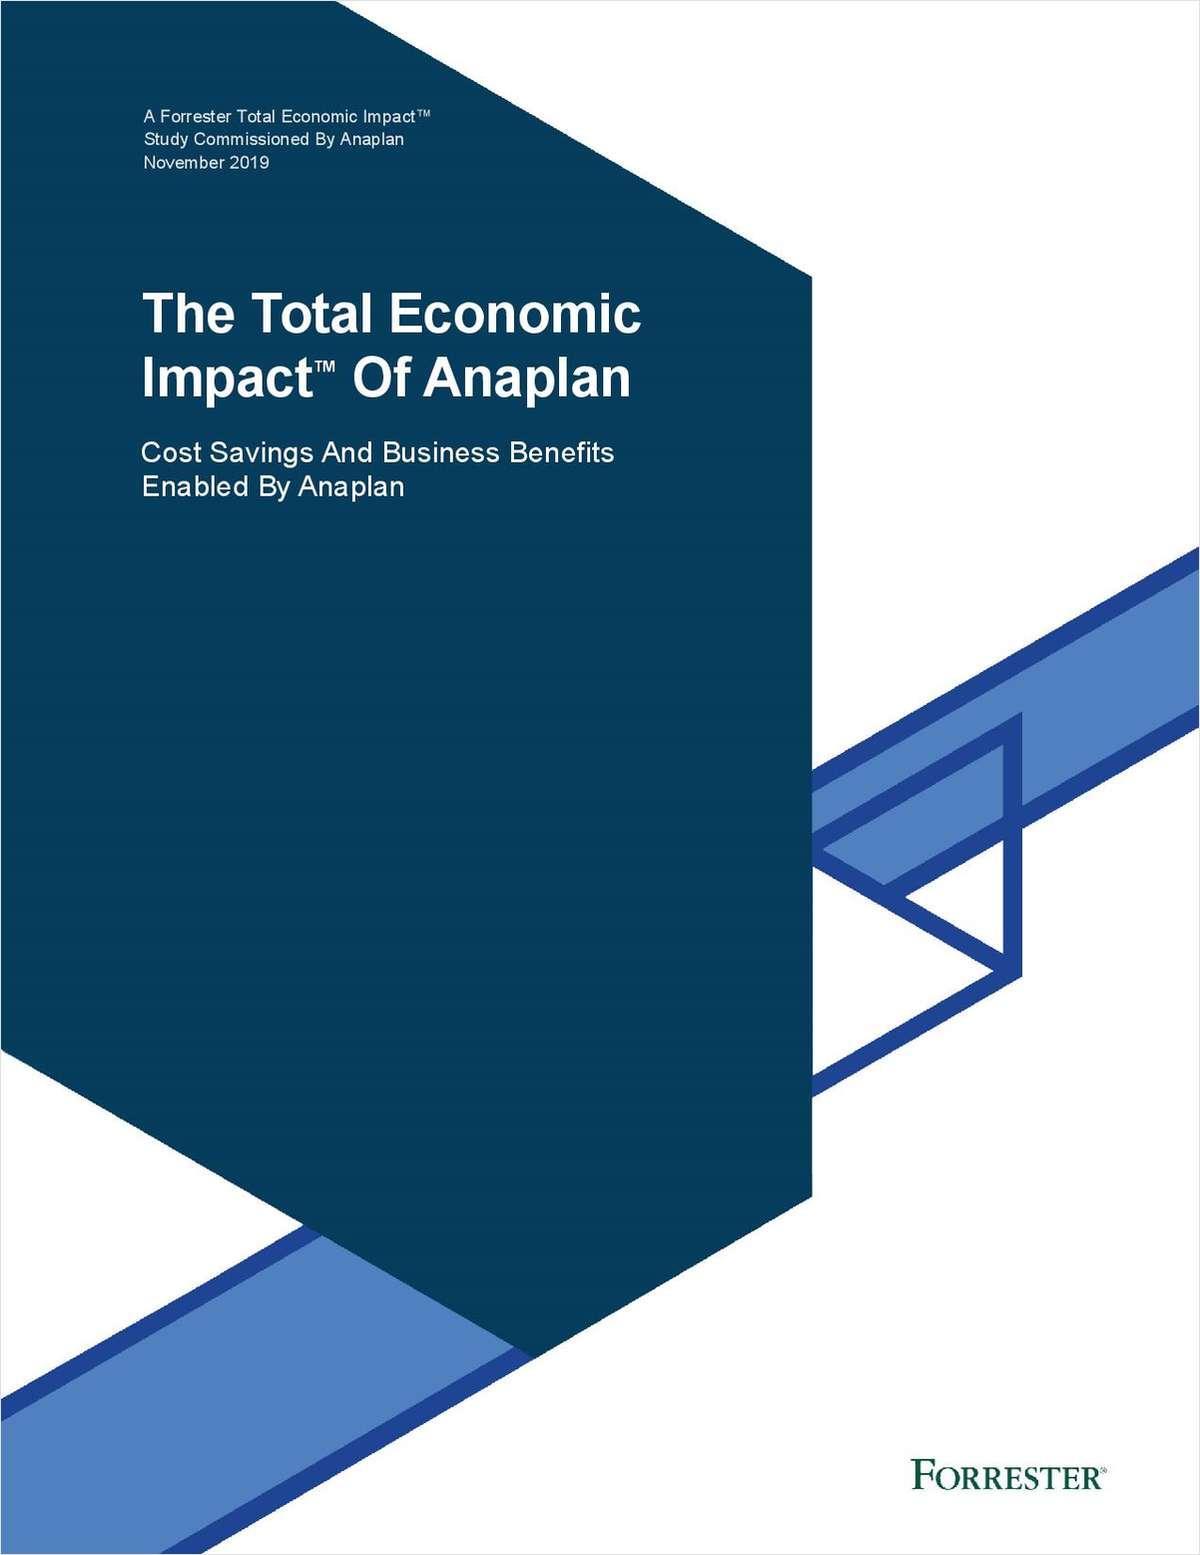 The Total Economic Impact of Anaplan